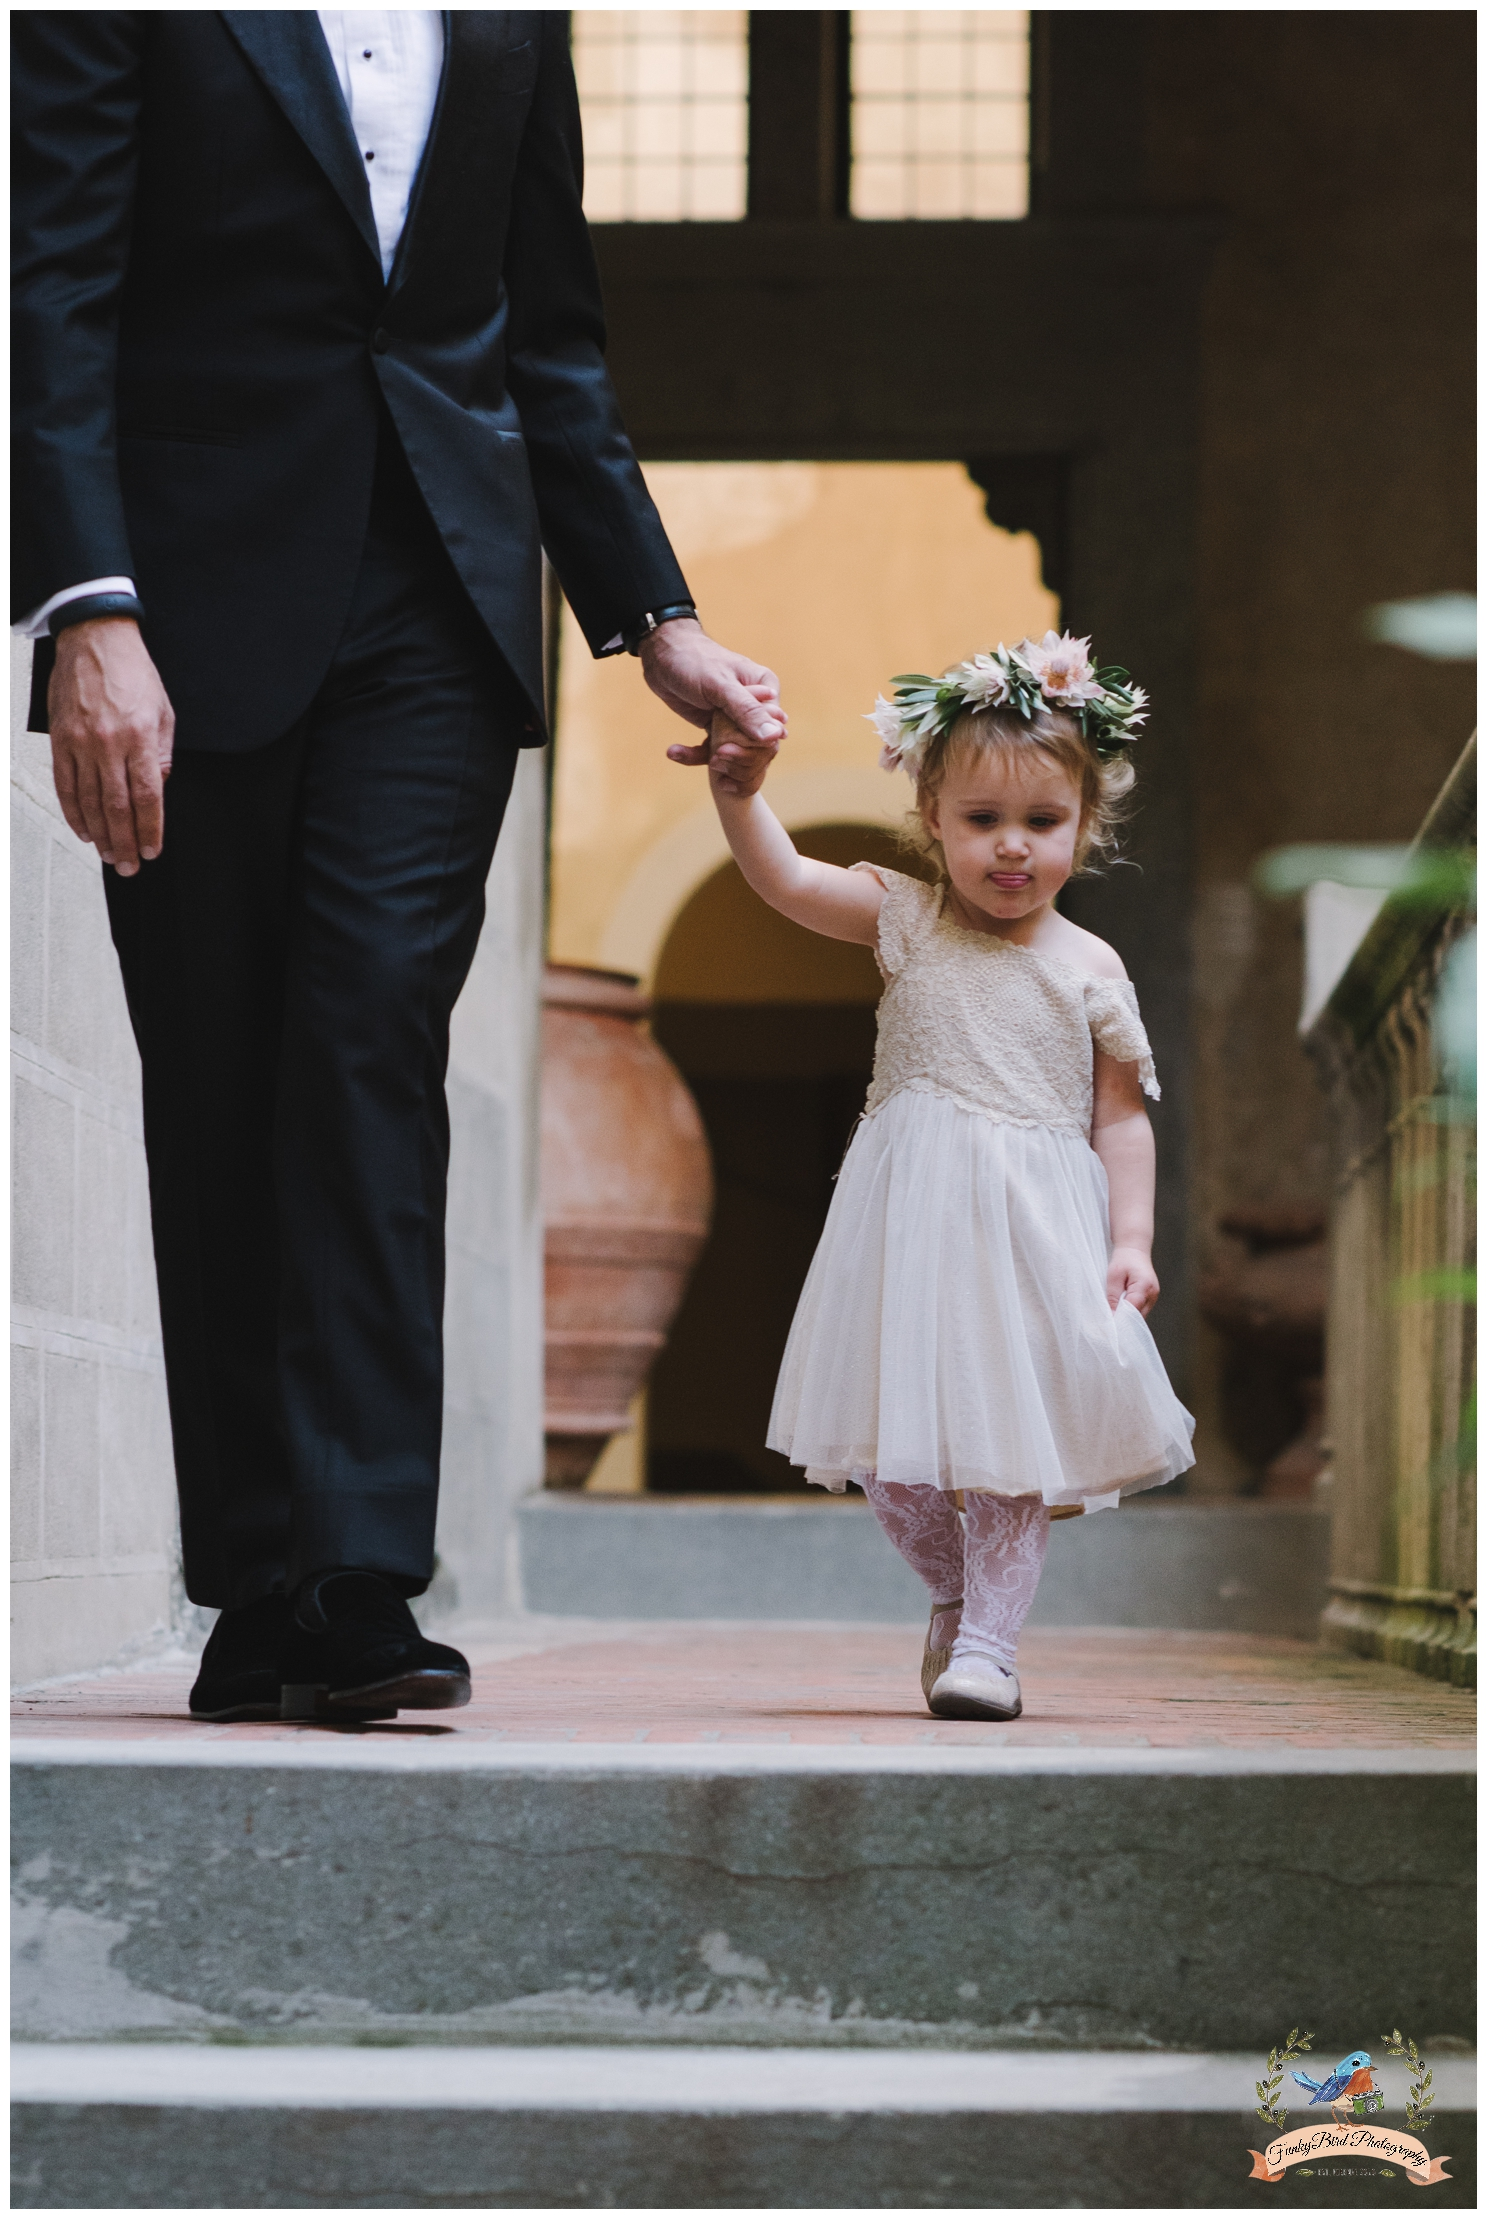 Wedding_Photographer_Tuscany_Italy_0022.jpg